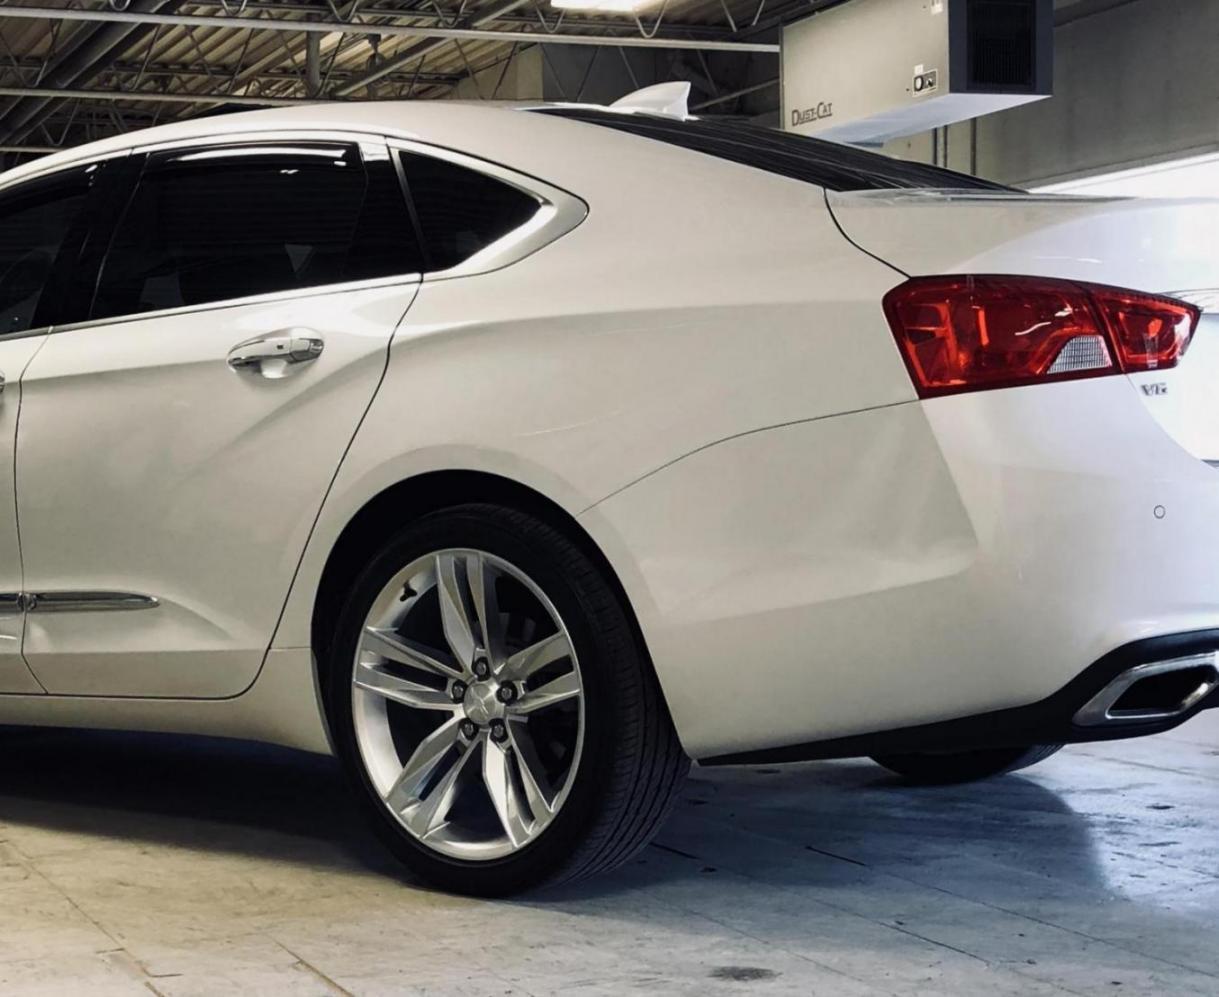 Hello Epsilon II- 2014 Impala LTZ-0f1aa527-231d-4538-ab9c-525d46ae0c22_1528041159433.jpeg